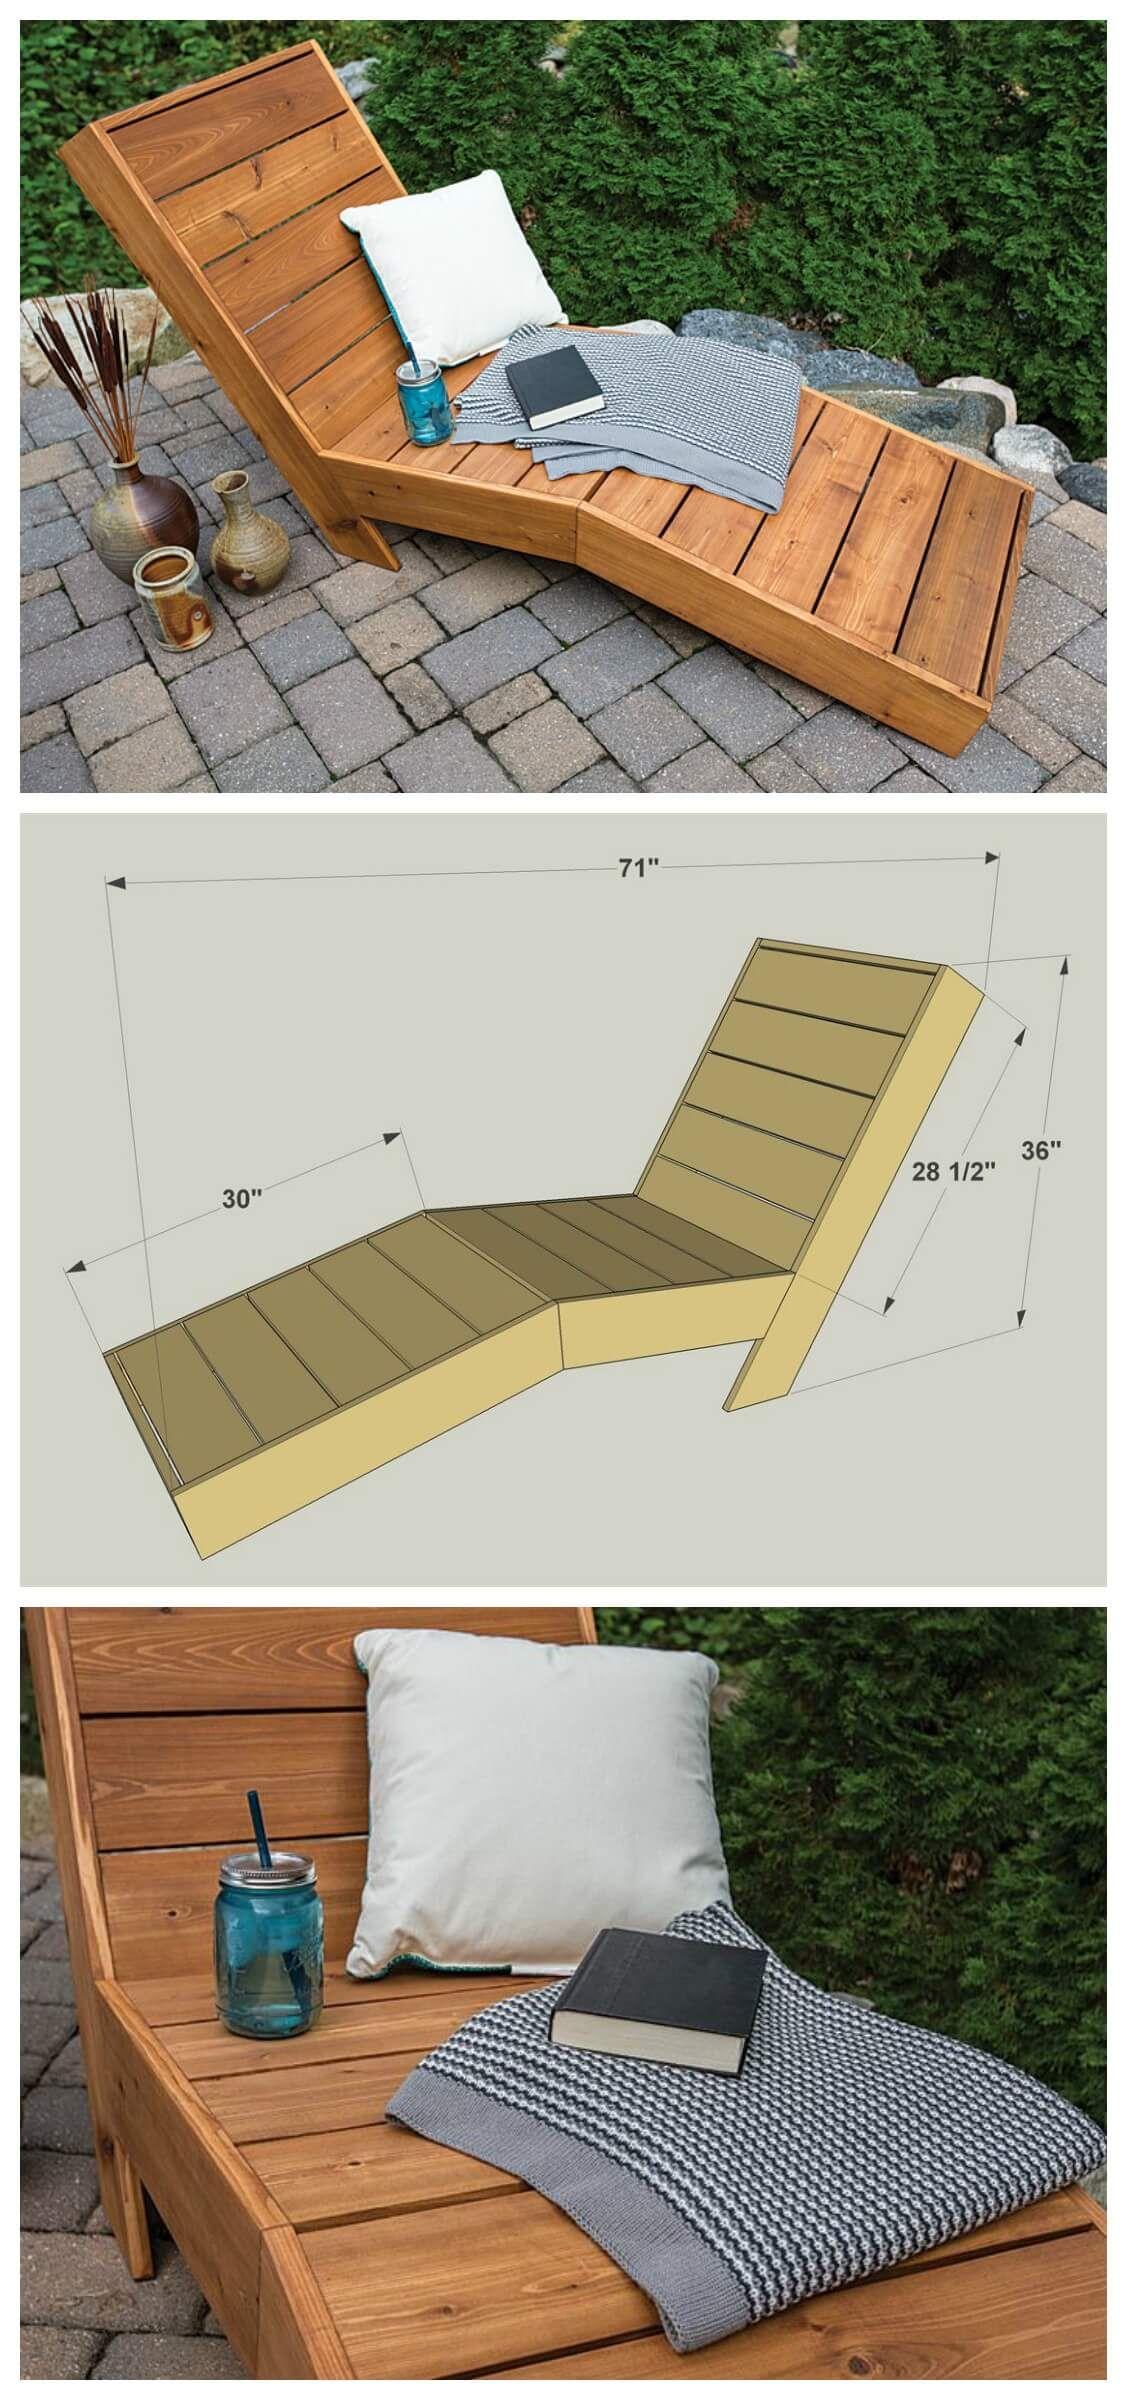 Diy Outdoor Furniture modern outdoor chair plans freeana-white #behrthinkoutside